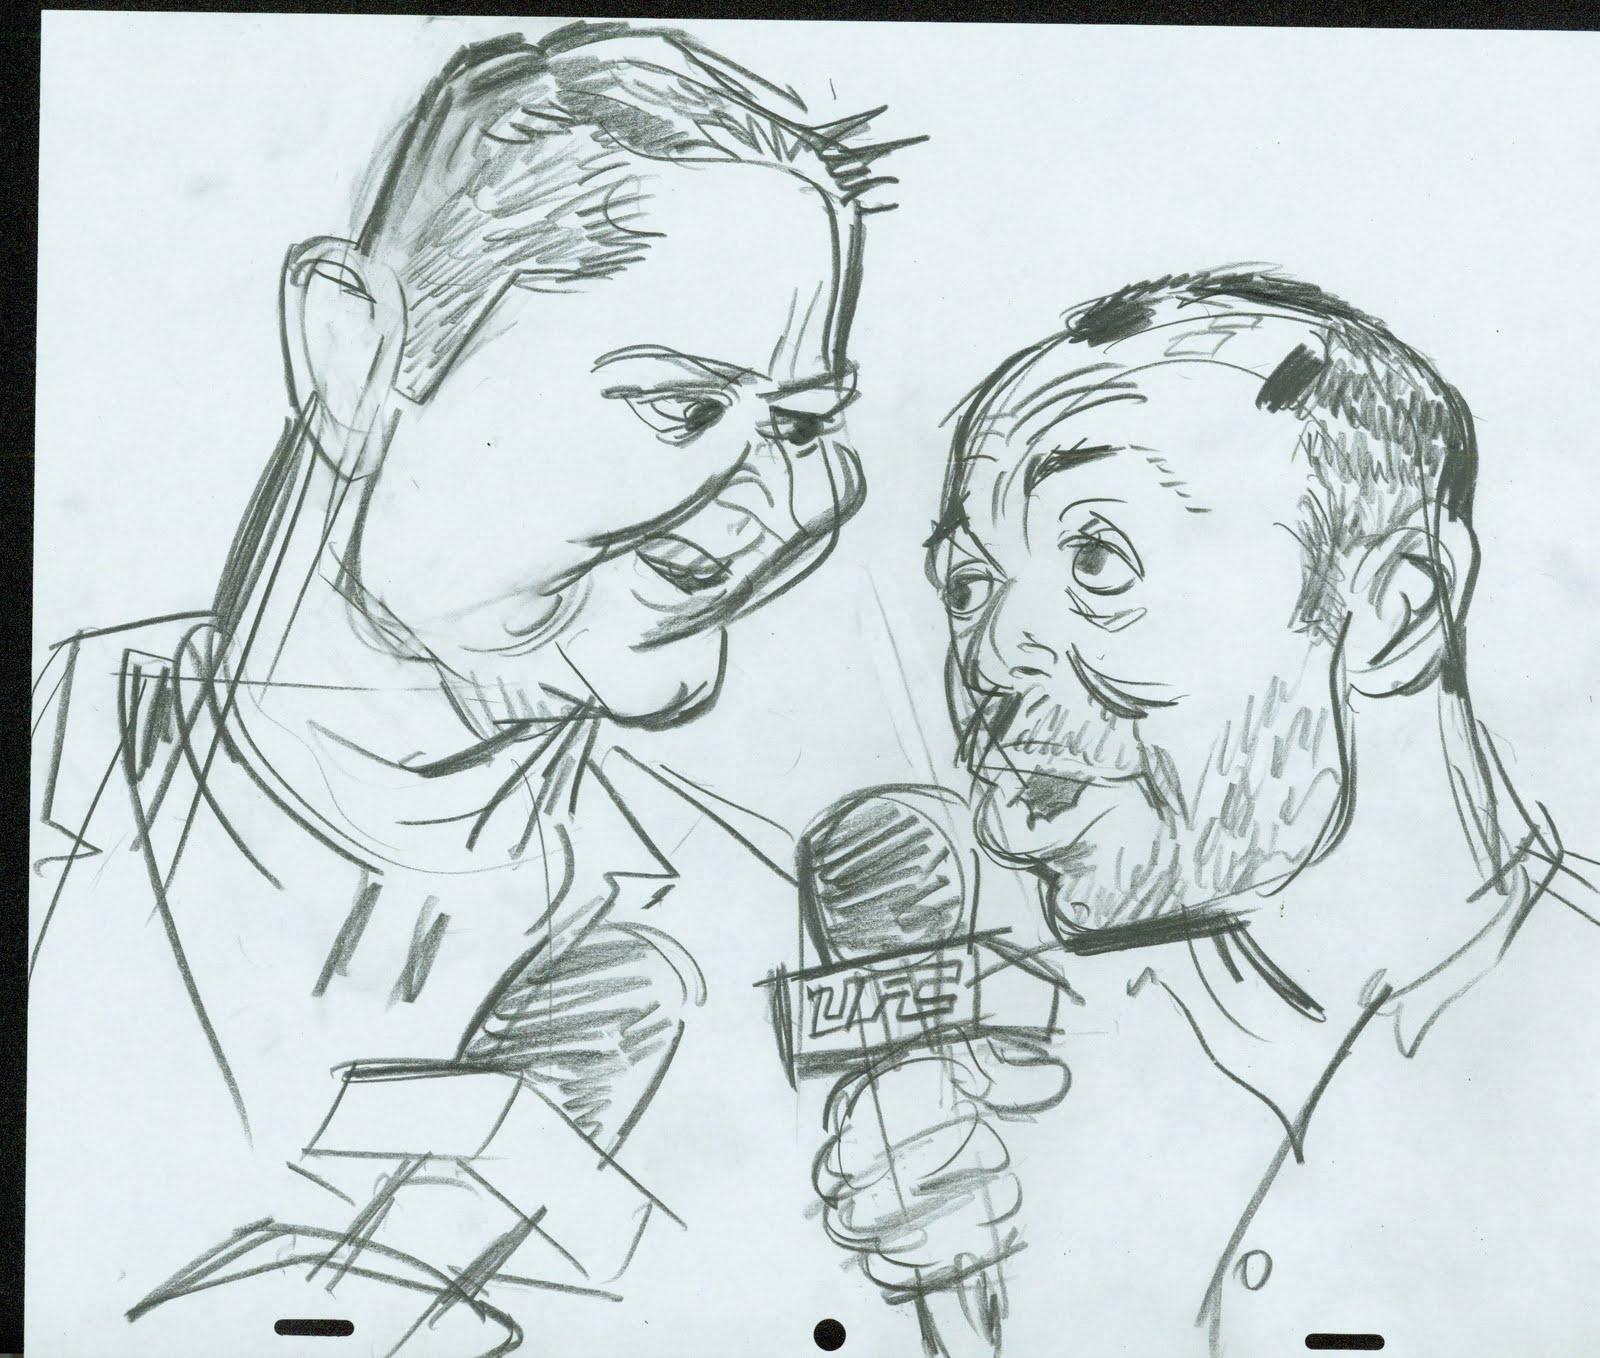 Ken Shamrock Character: Colin Blog-heed [title Pending]: Saturday Morning Cartoons